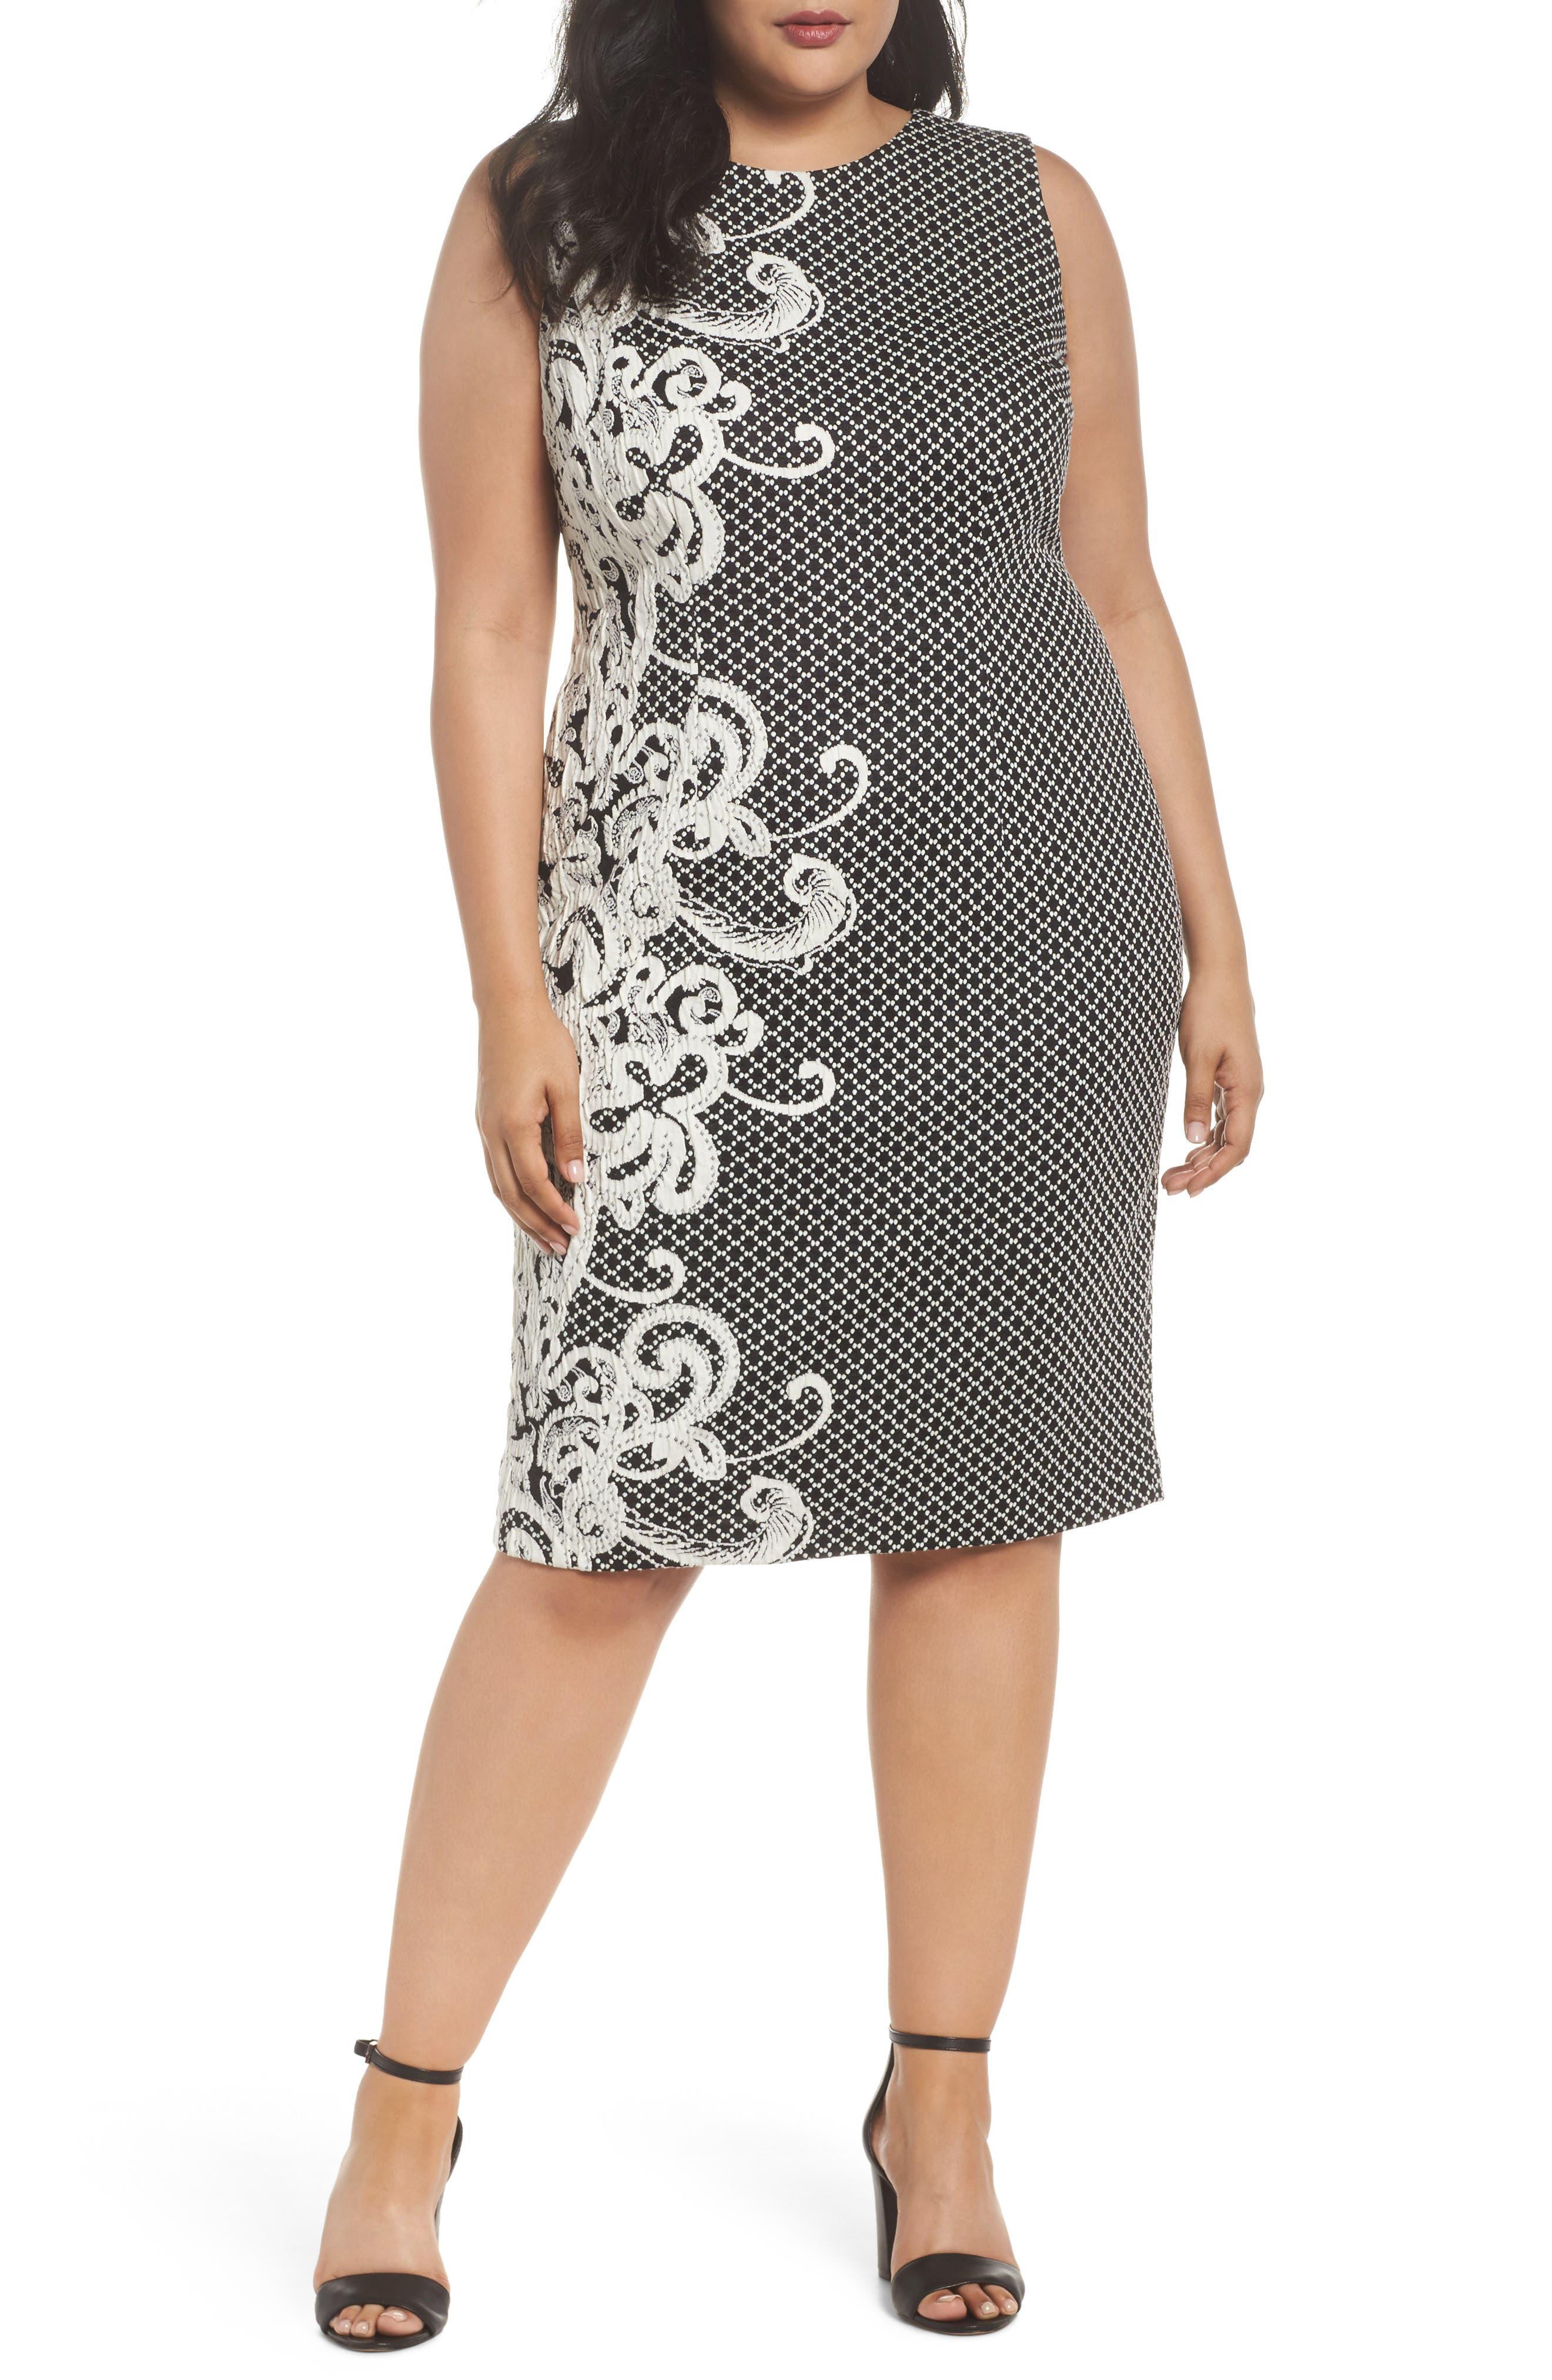 Scroll Border Knit Sheath Dress,                         Main,                         color, Black/ Ivory